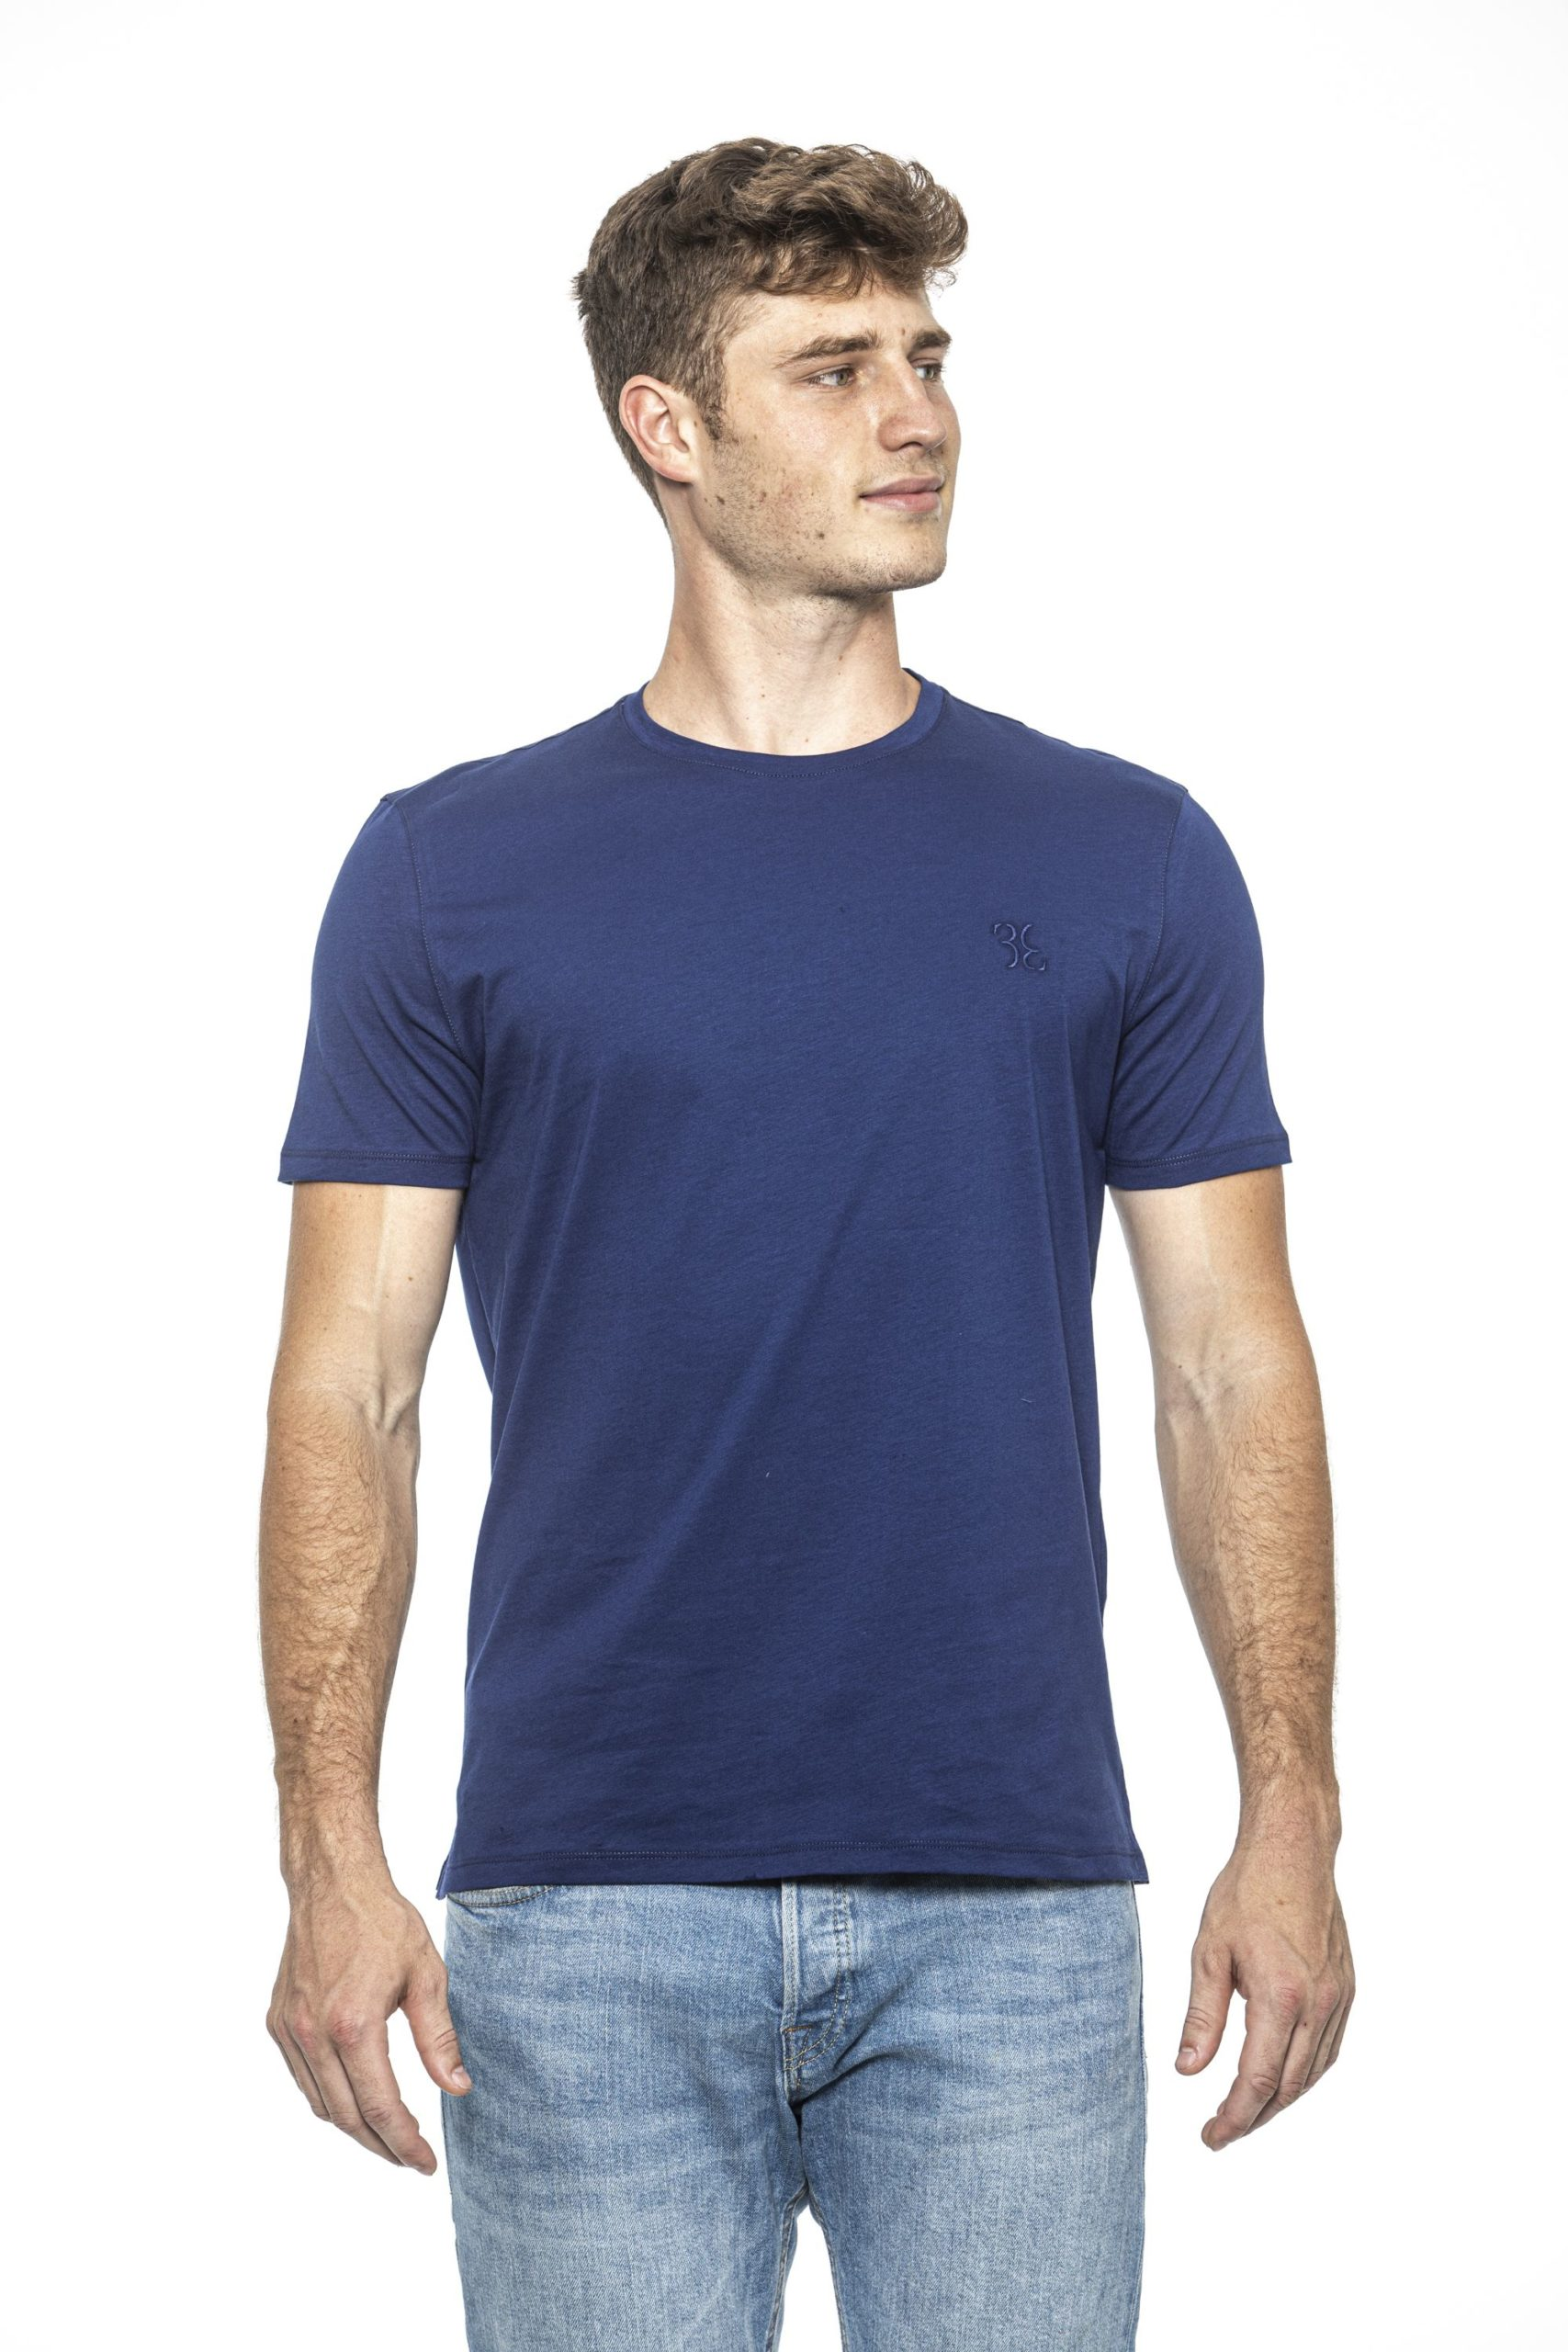 Billionaire Italian Couture Men's T-Shirt Blue BI1397988 - S